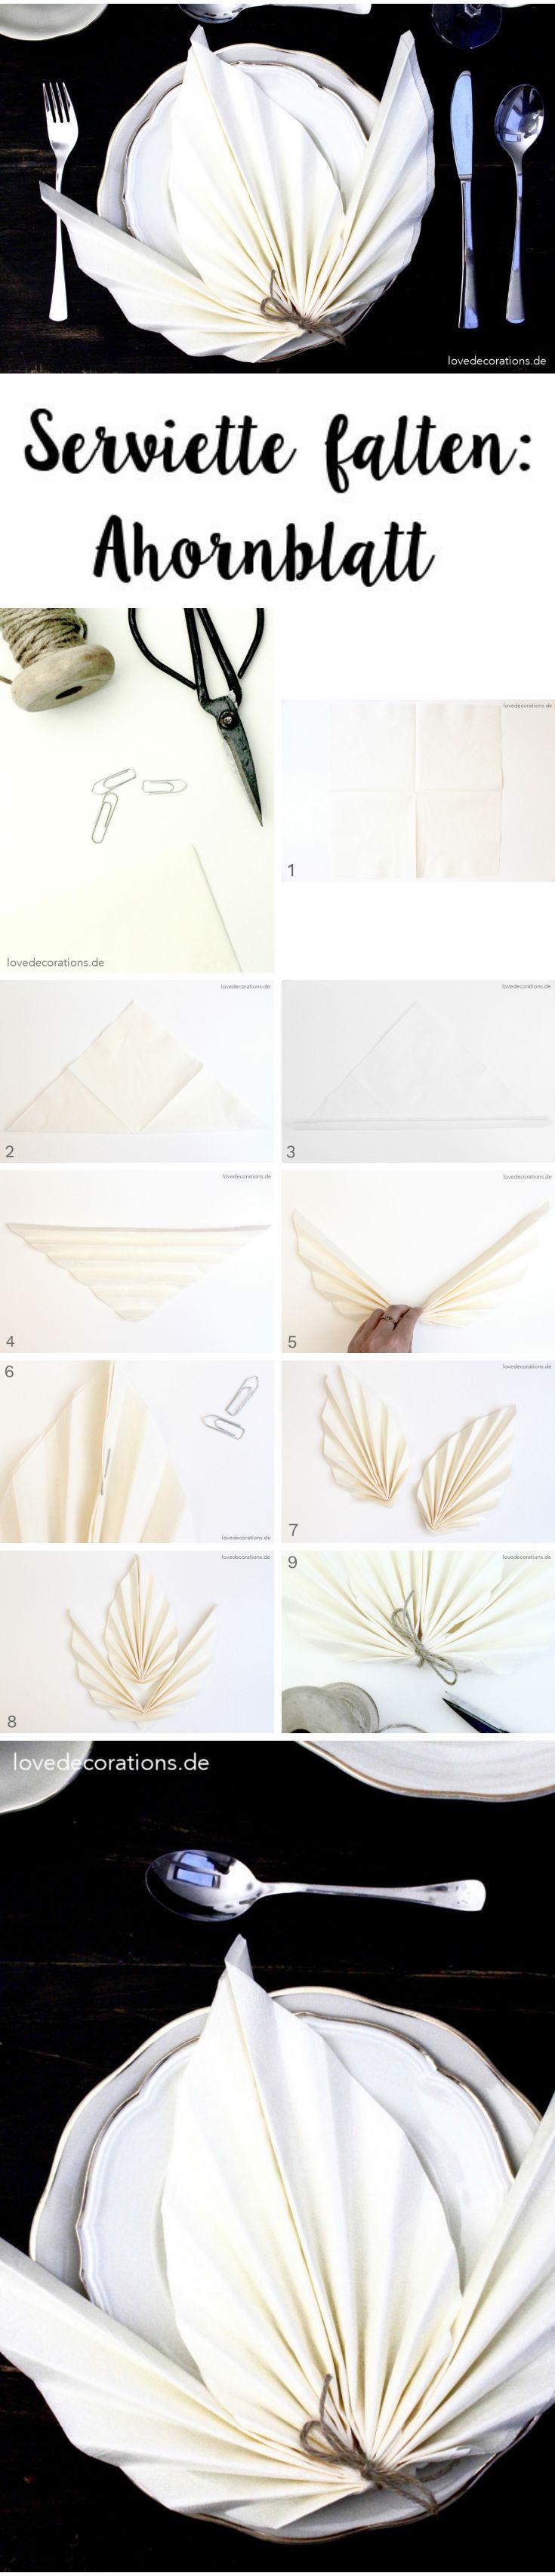 Serviette falten: Ahornblatt